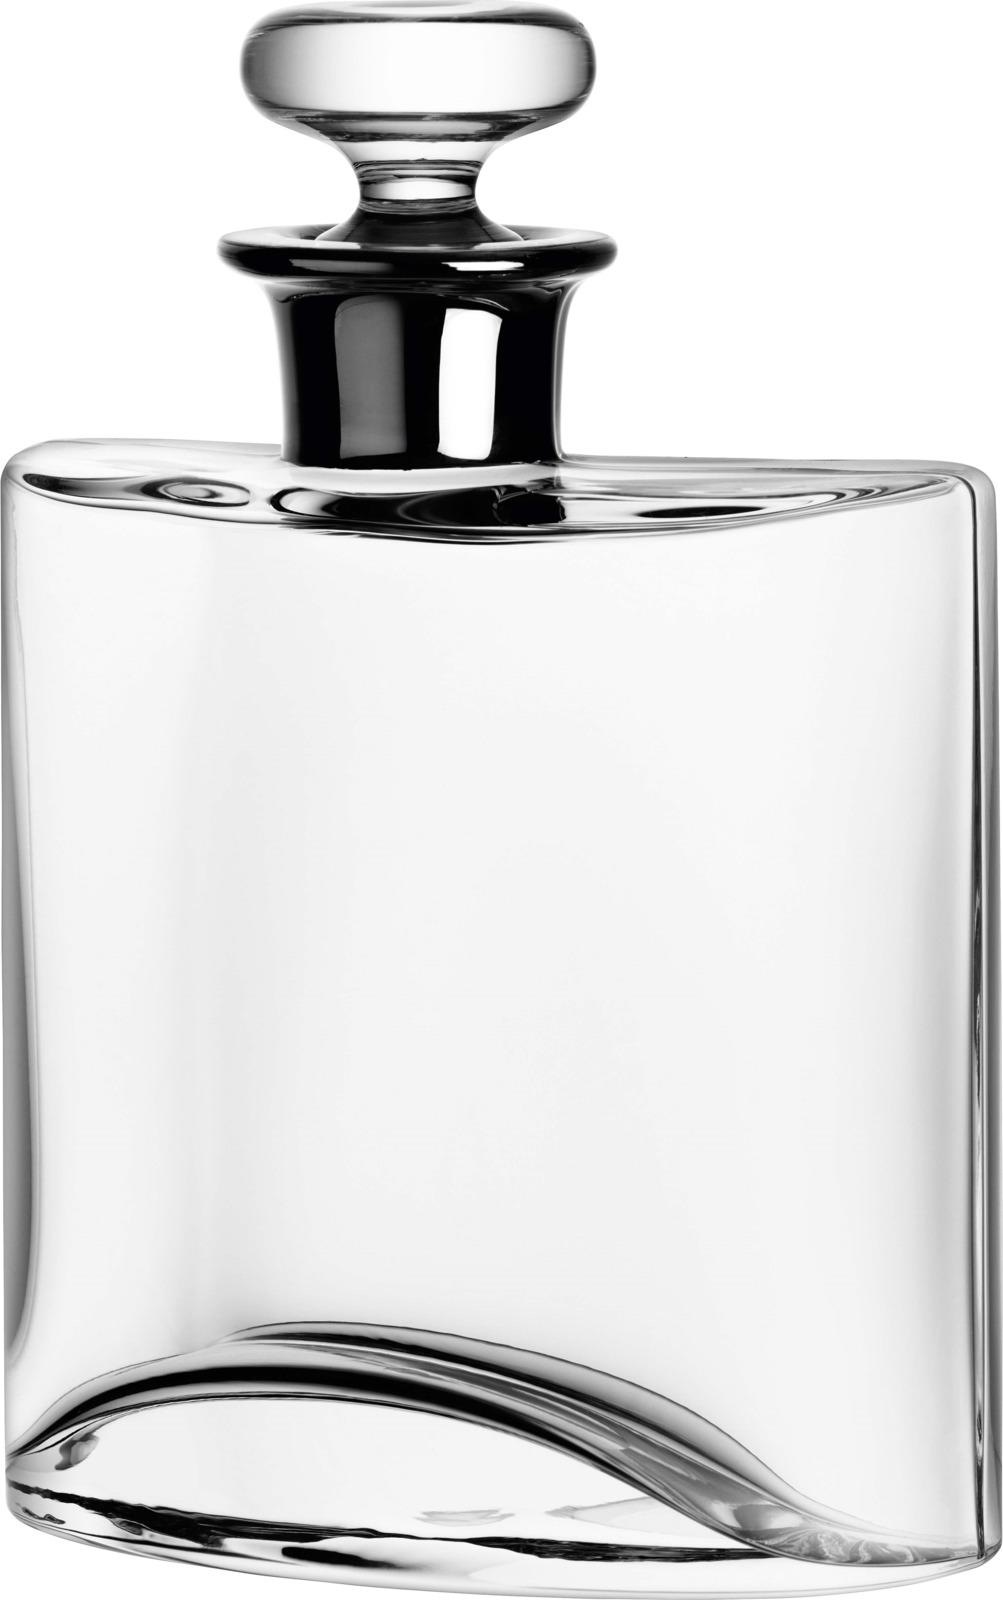 Декантер LSA Flask, 800 мл декантер lsa international flask 0 8 л